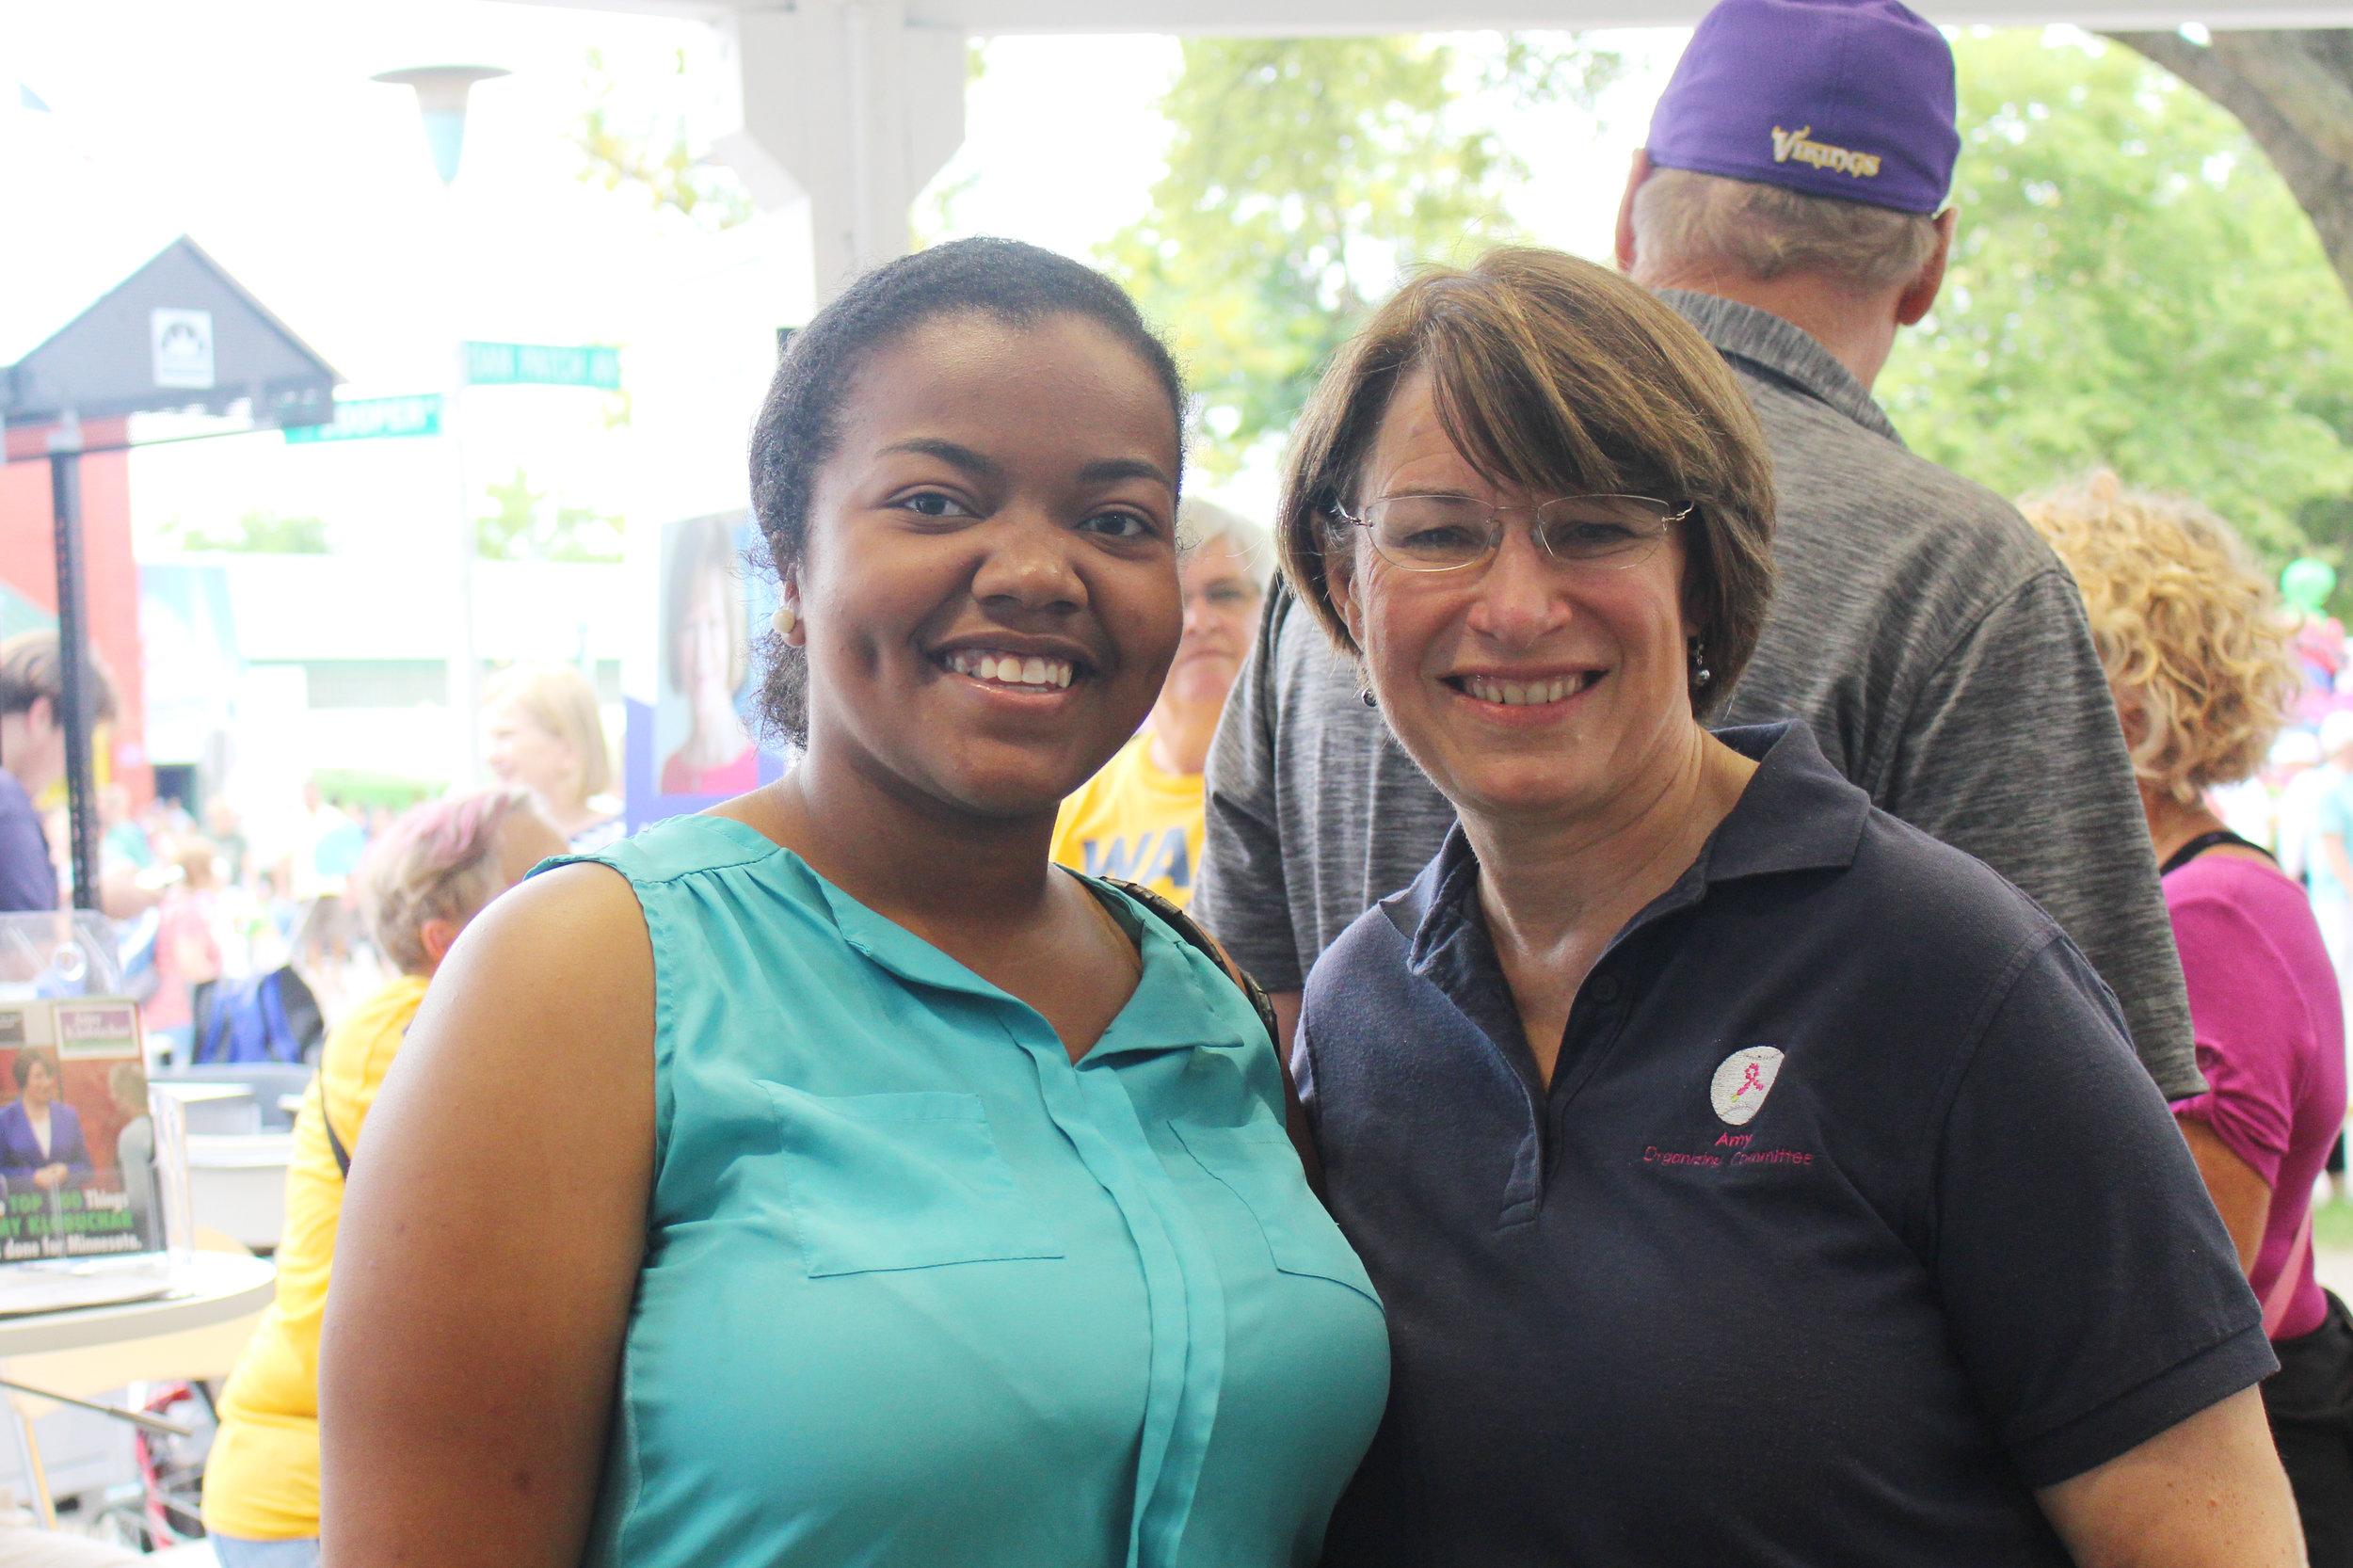 Cheniqua posing for a photo with United States Senator Amy Klobuchar